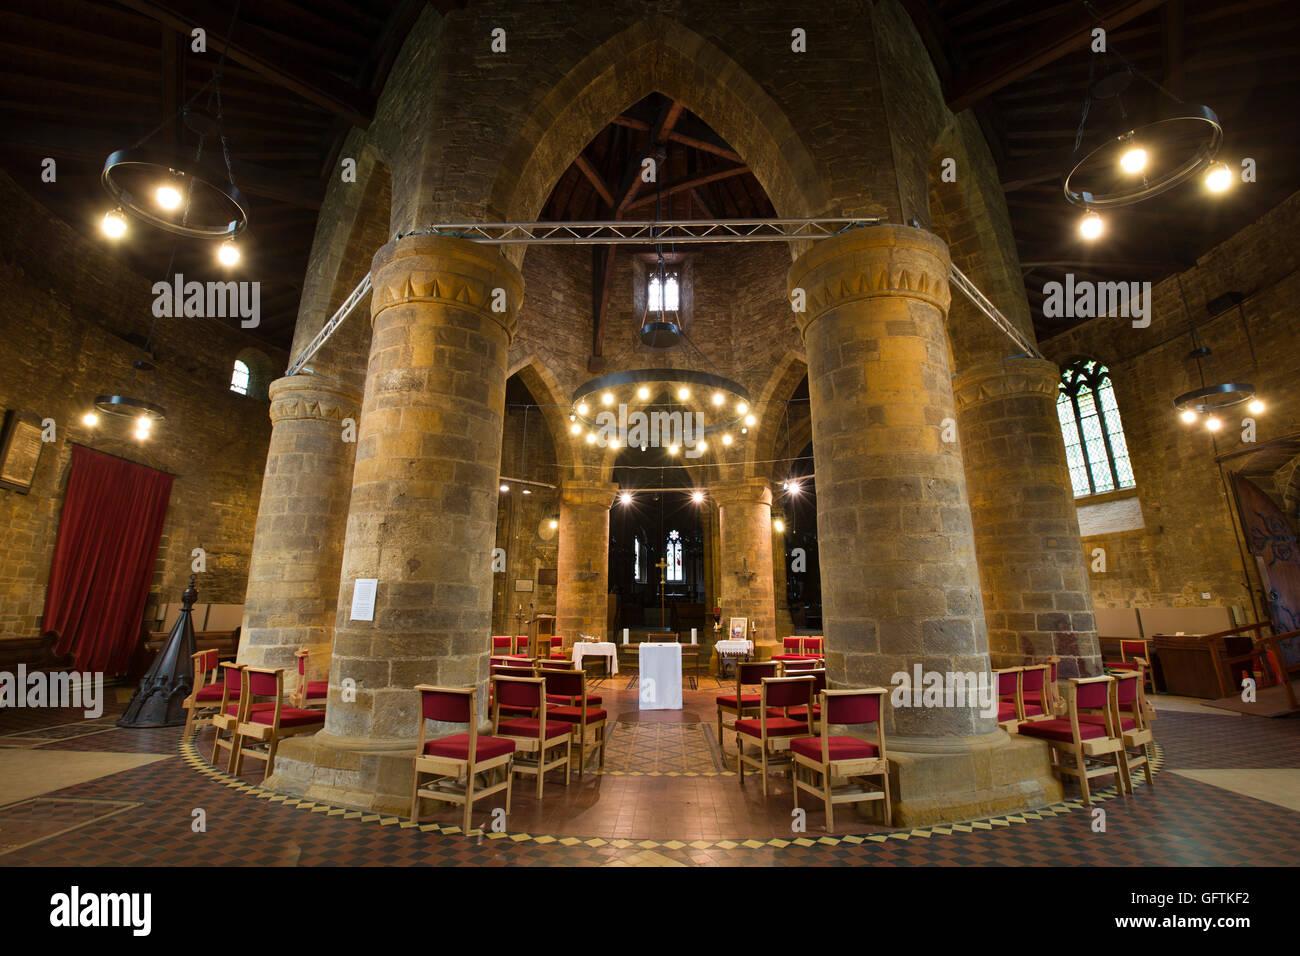 UK, England, Northamptonshire, Northampton, Church of Holy Sepulchre, original circular nave - Stock Image